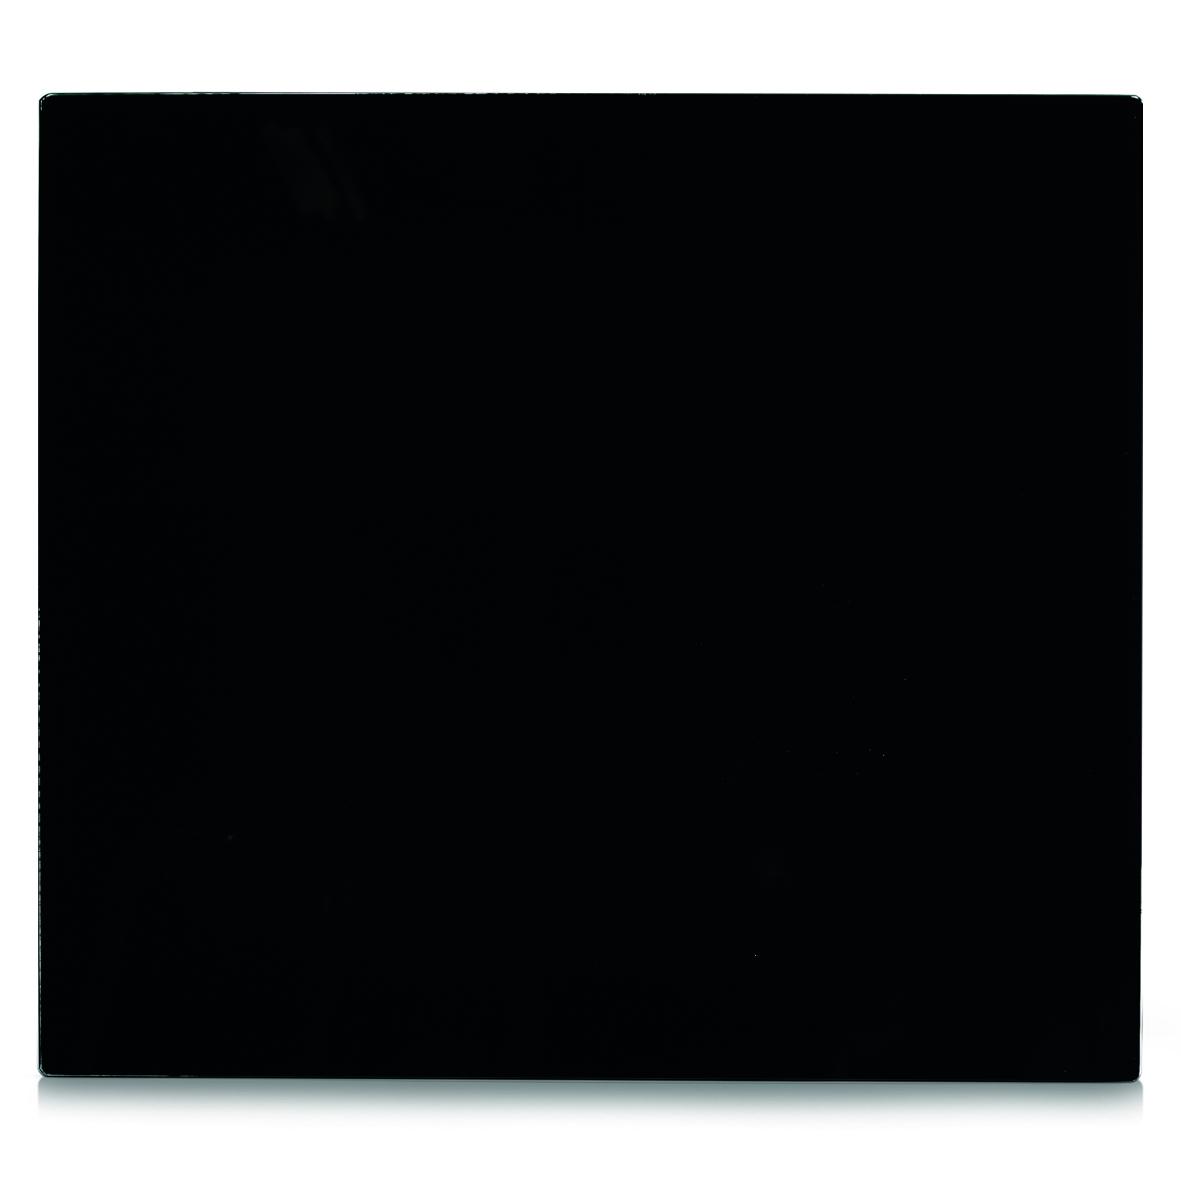 Placa din sticla protectie perete/plita, Black, l56xA50 cm poza